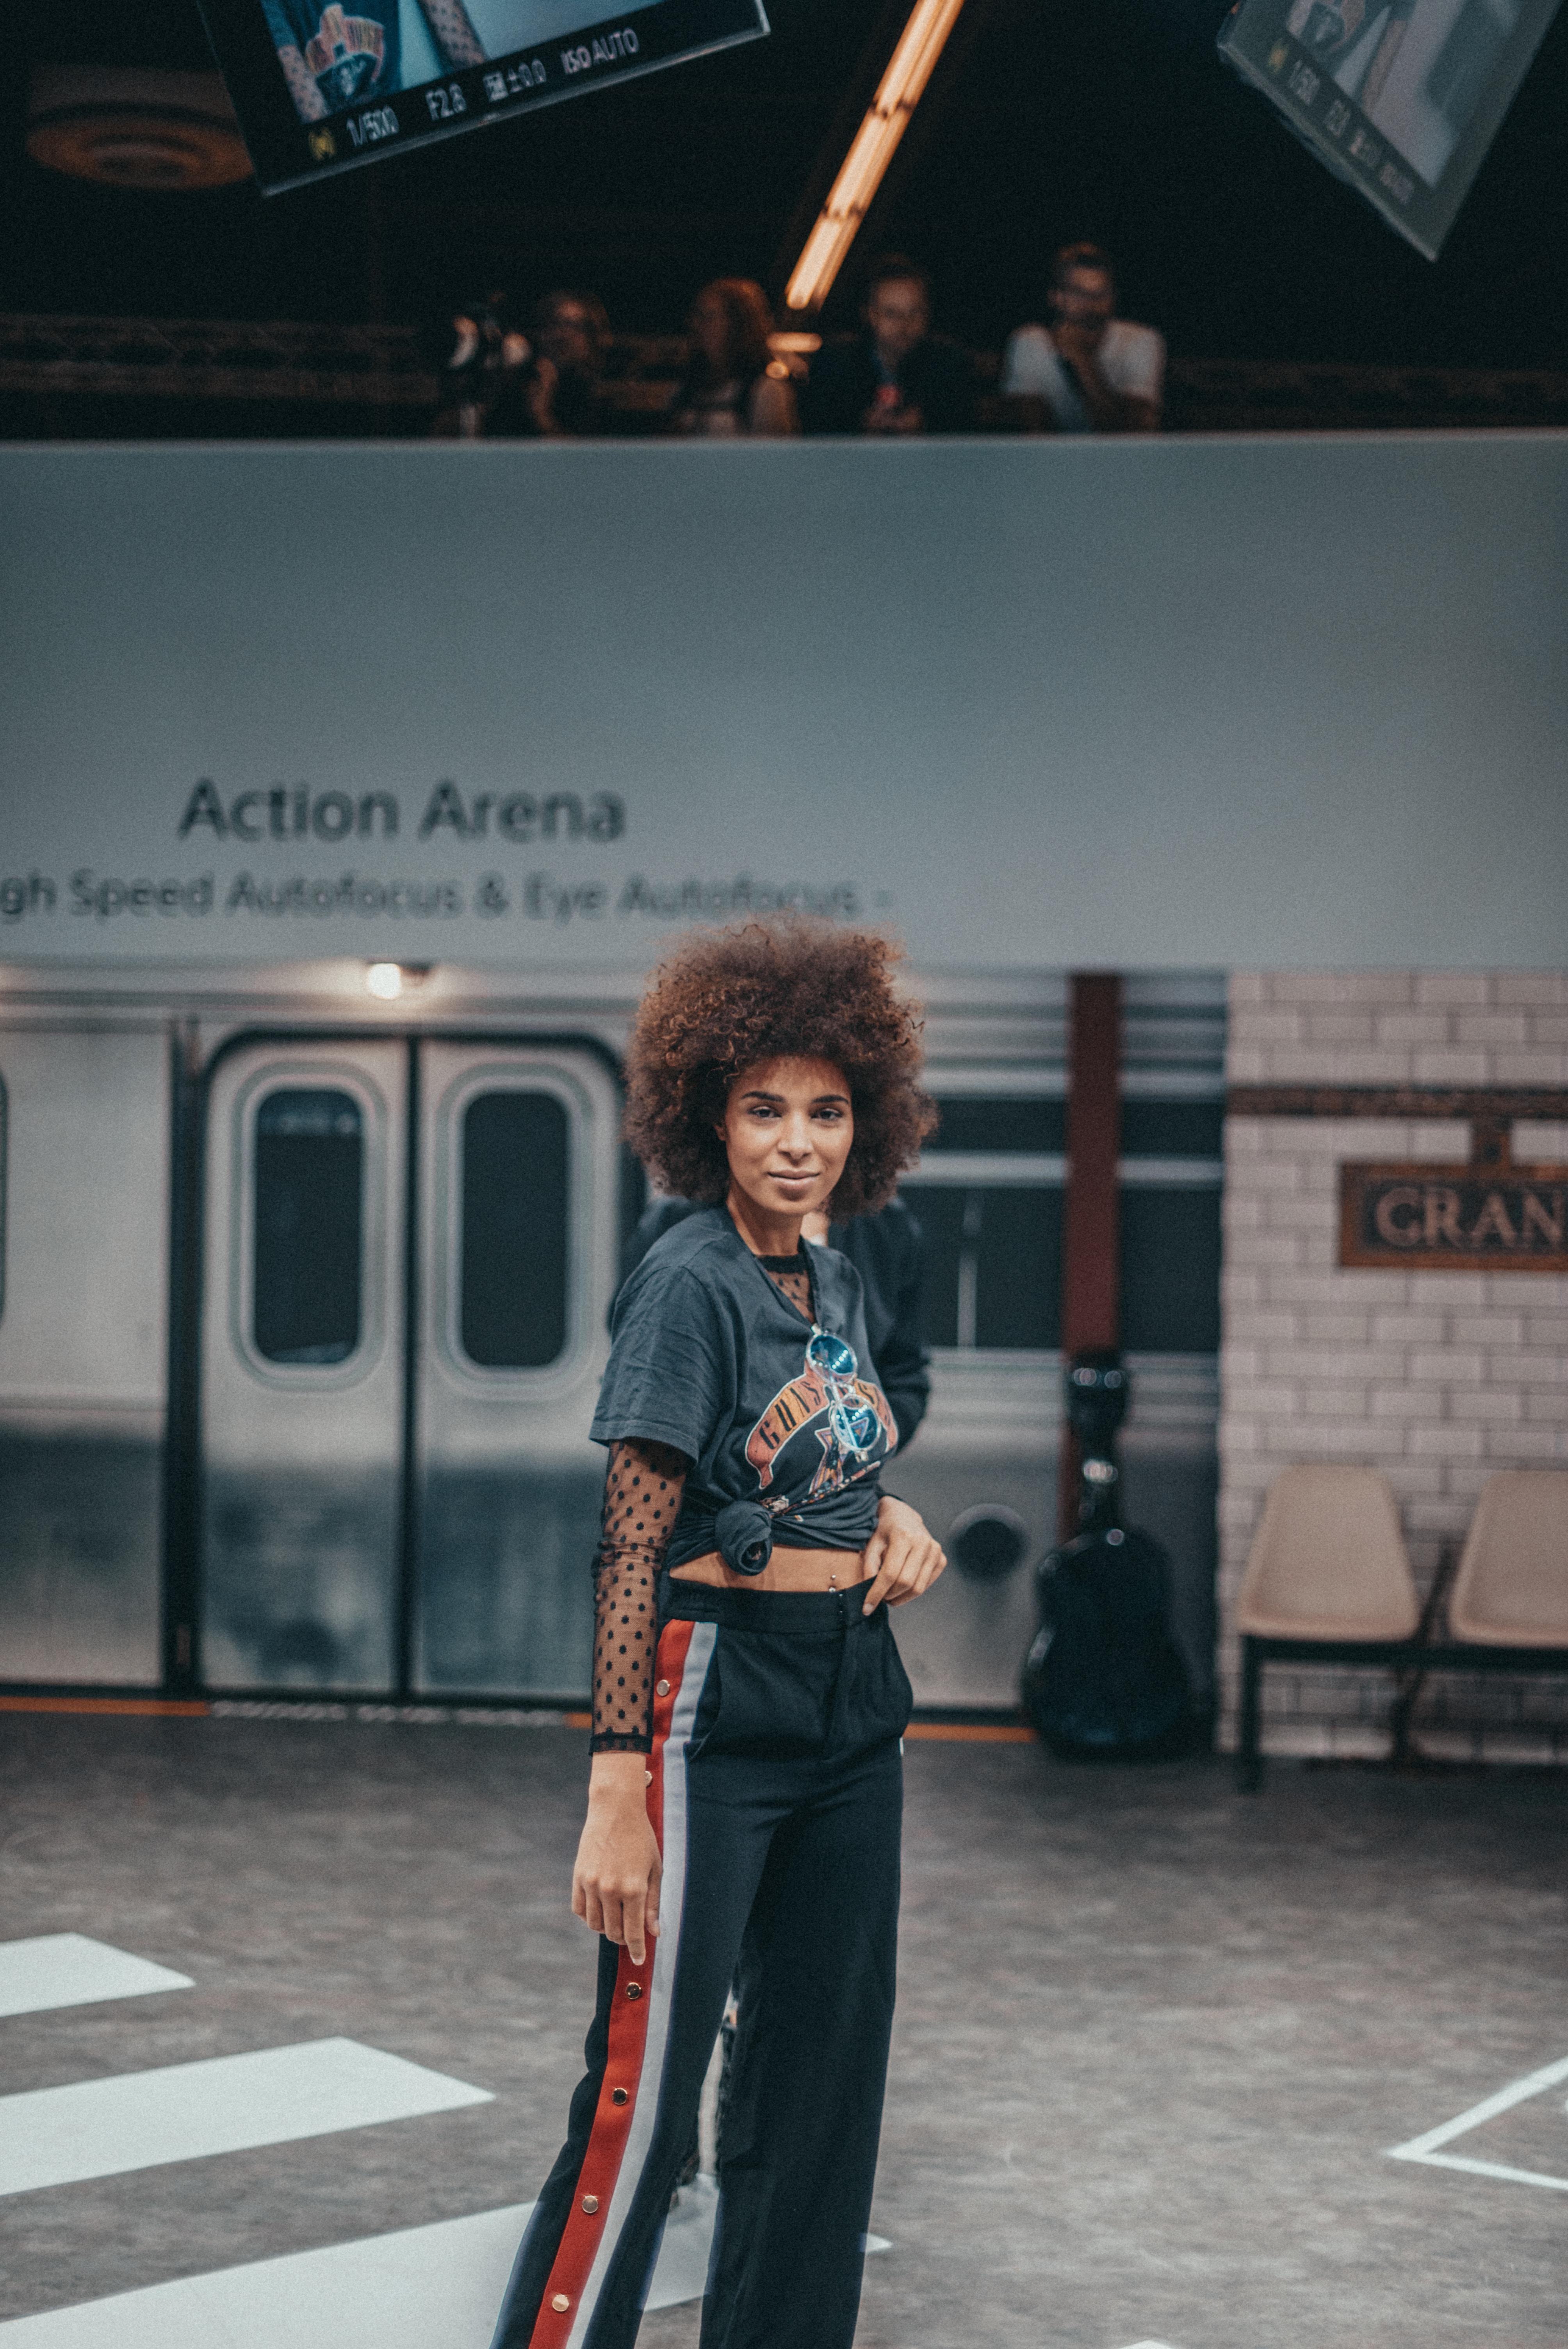 woman inside train station